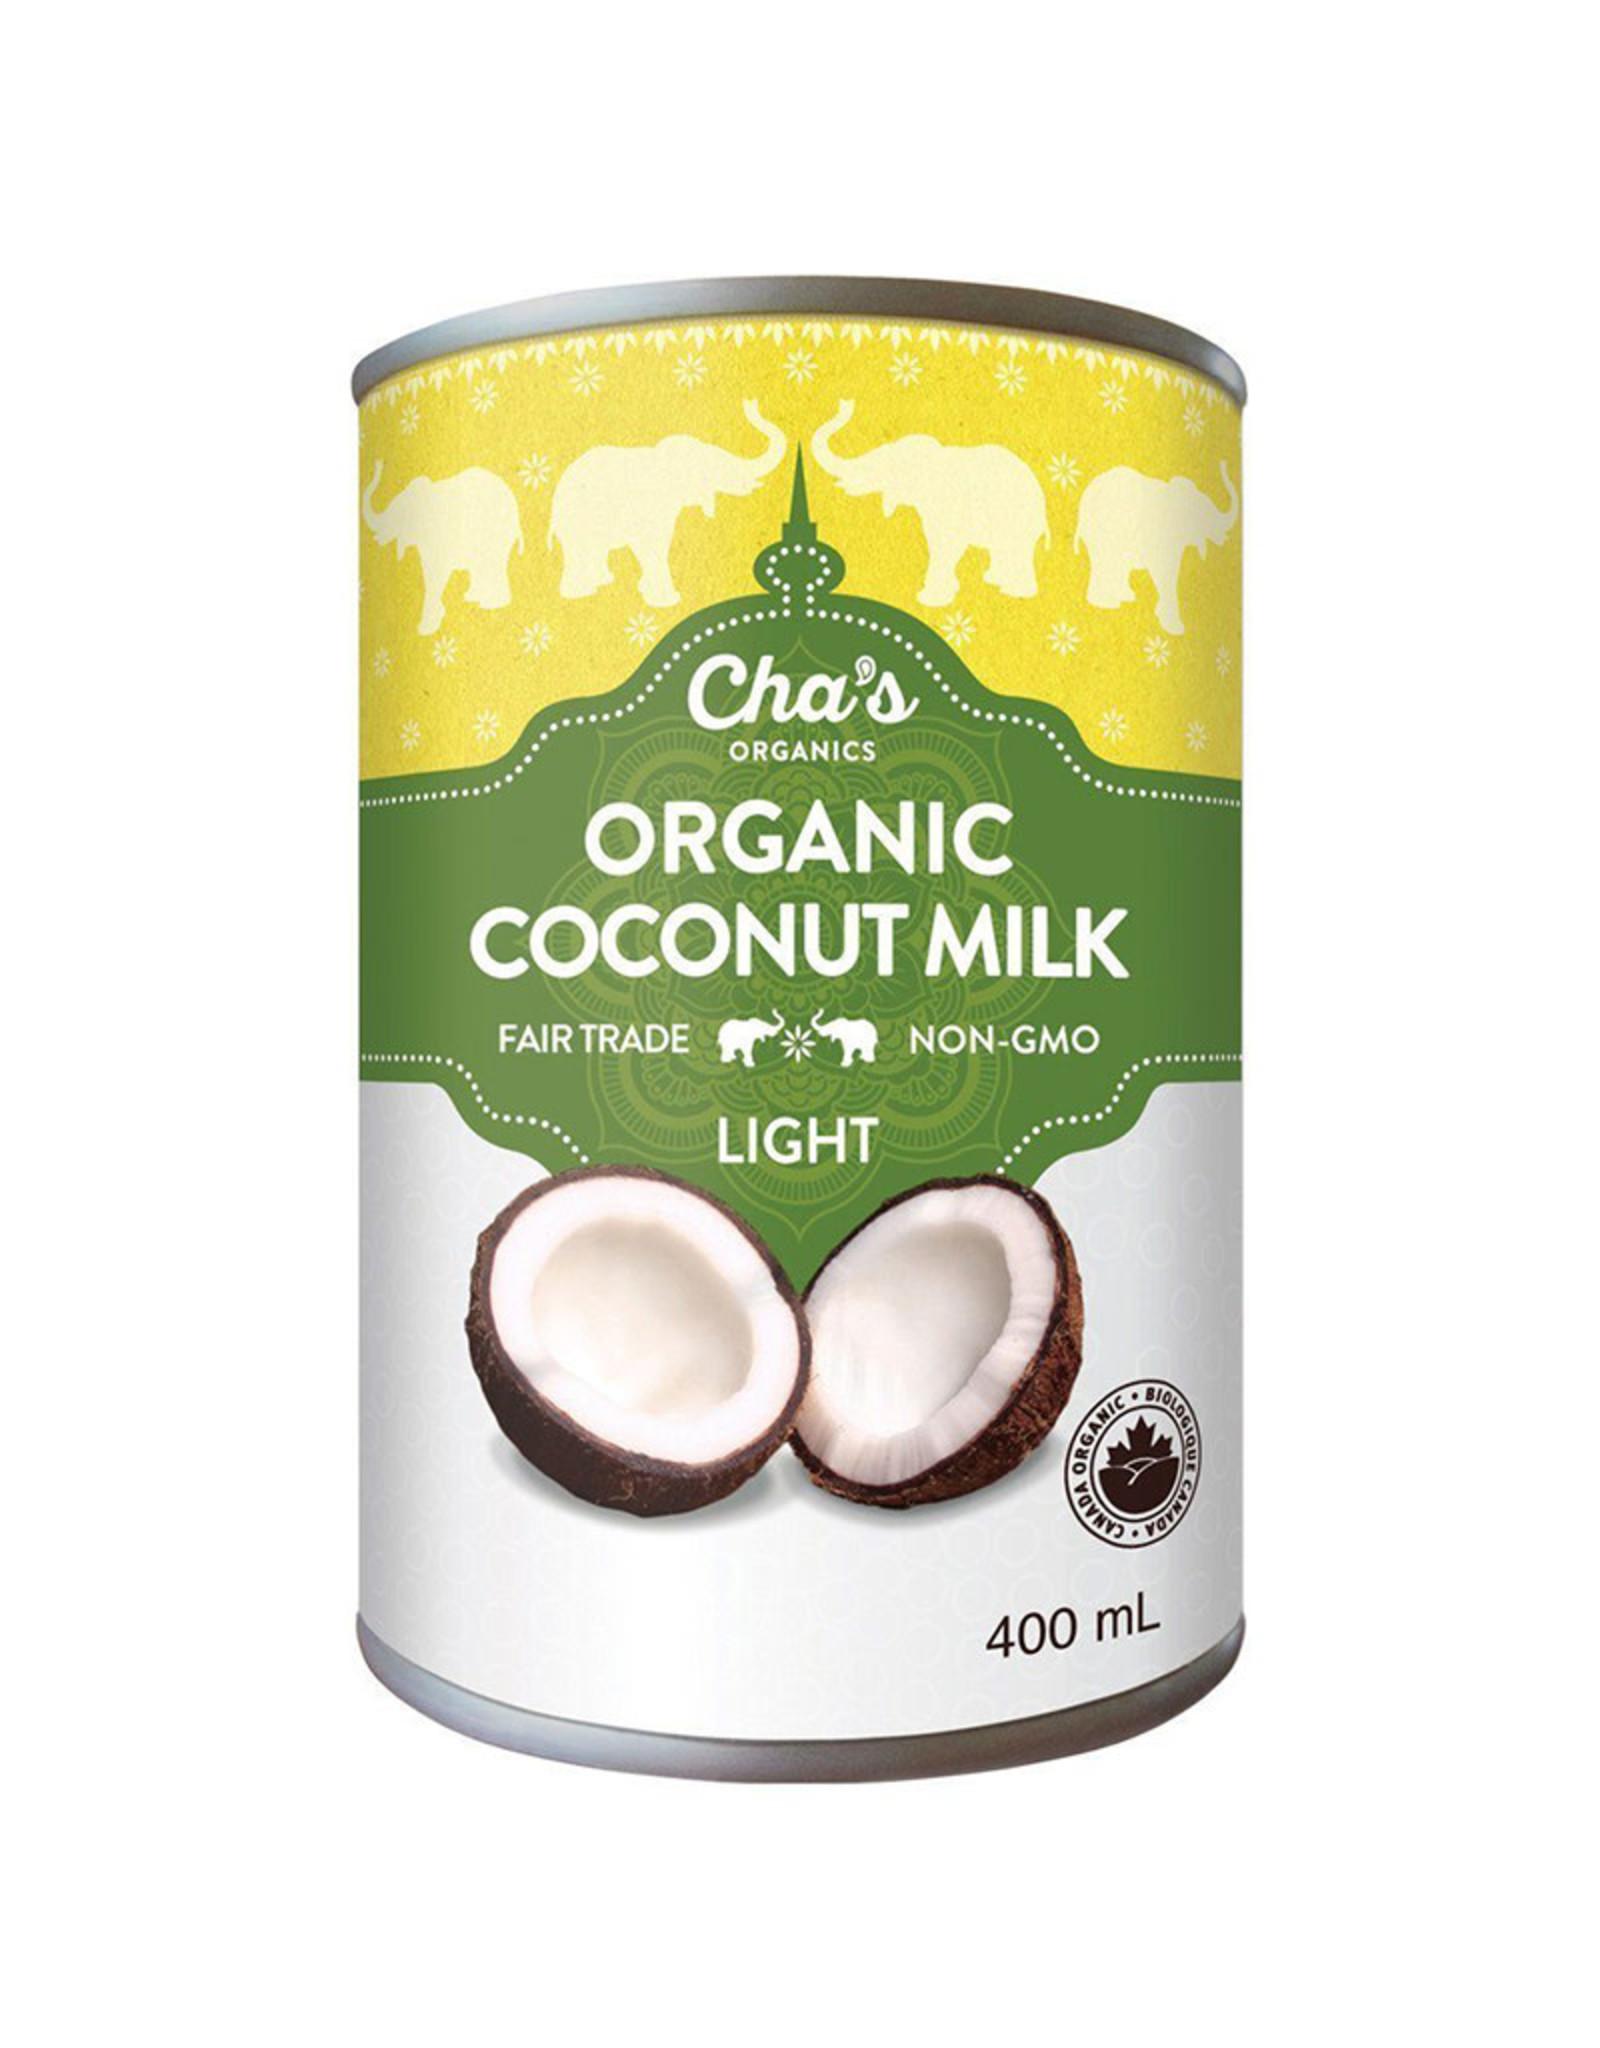 Cha's Organics Chas Organics - Coconut Milk, Light (400ml)